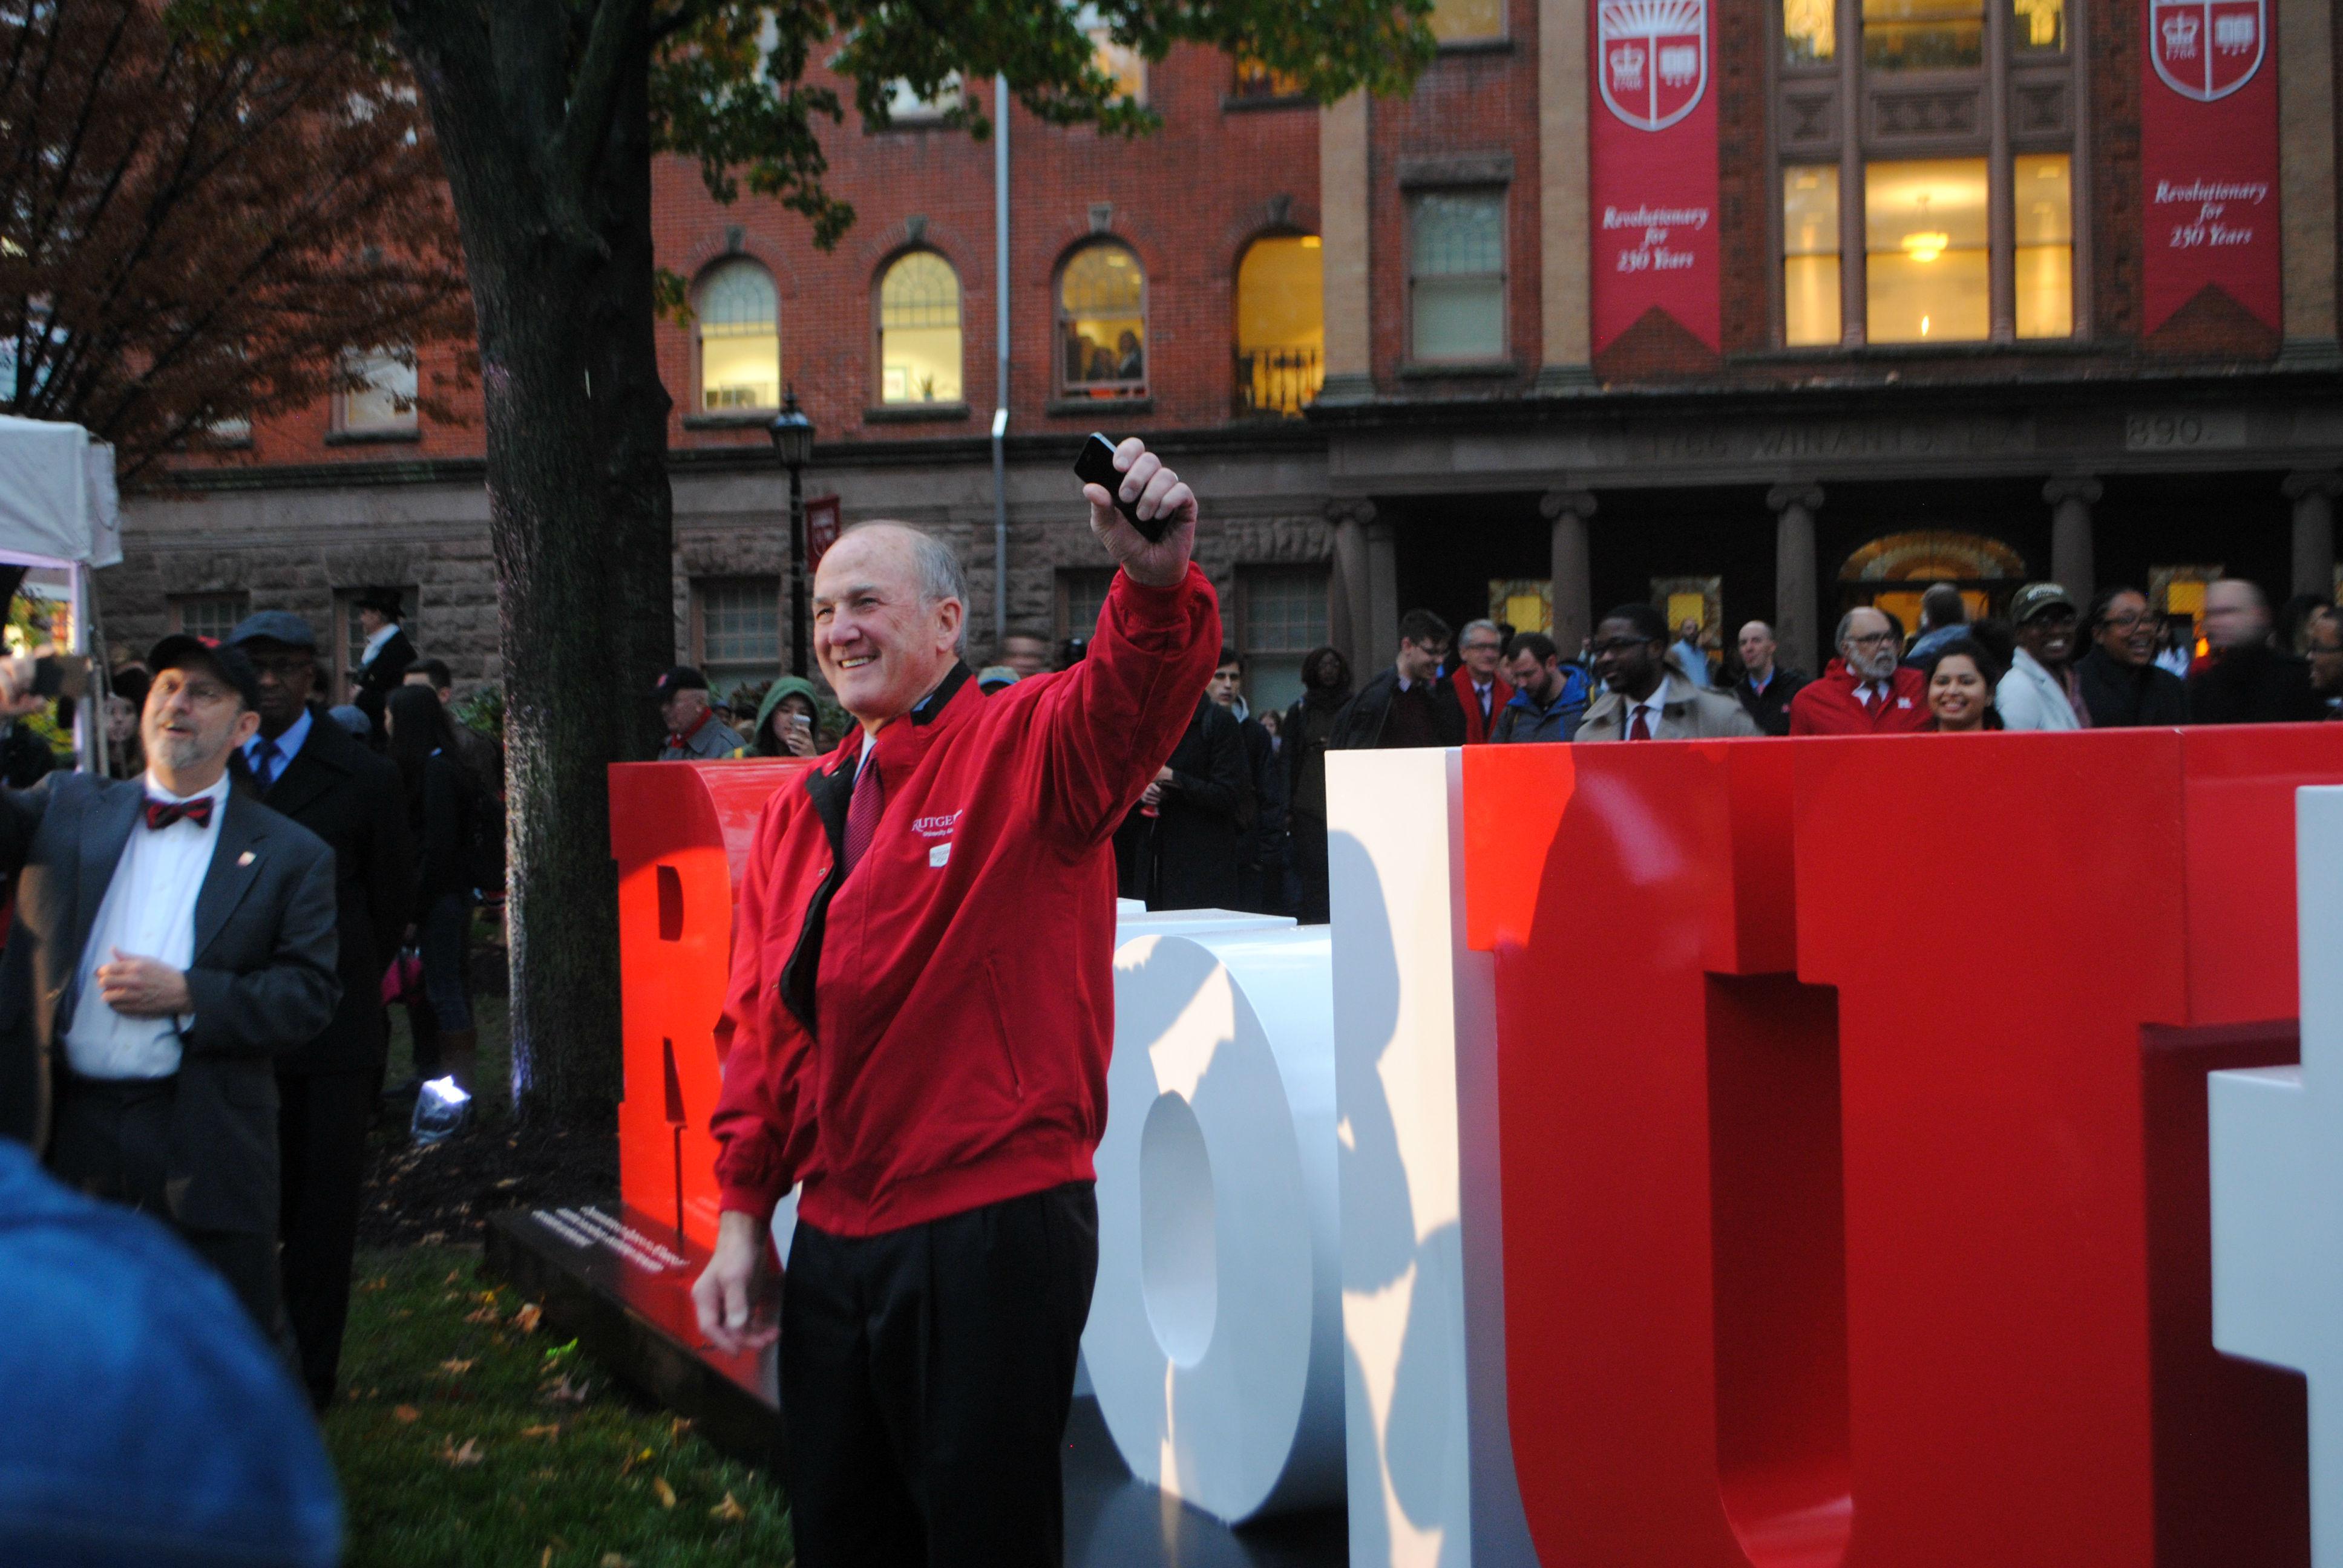 President of Rutgers University, Robert Barchi.